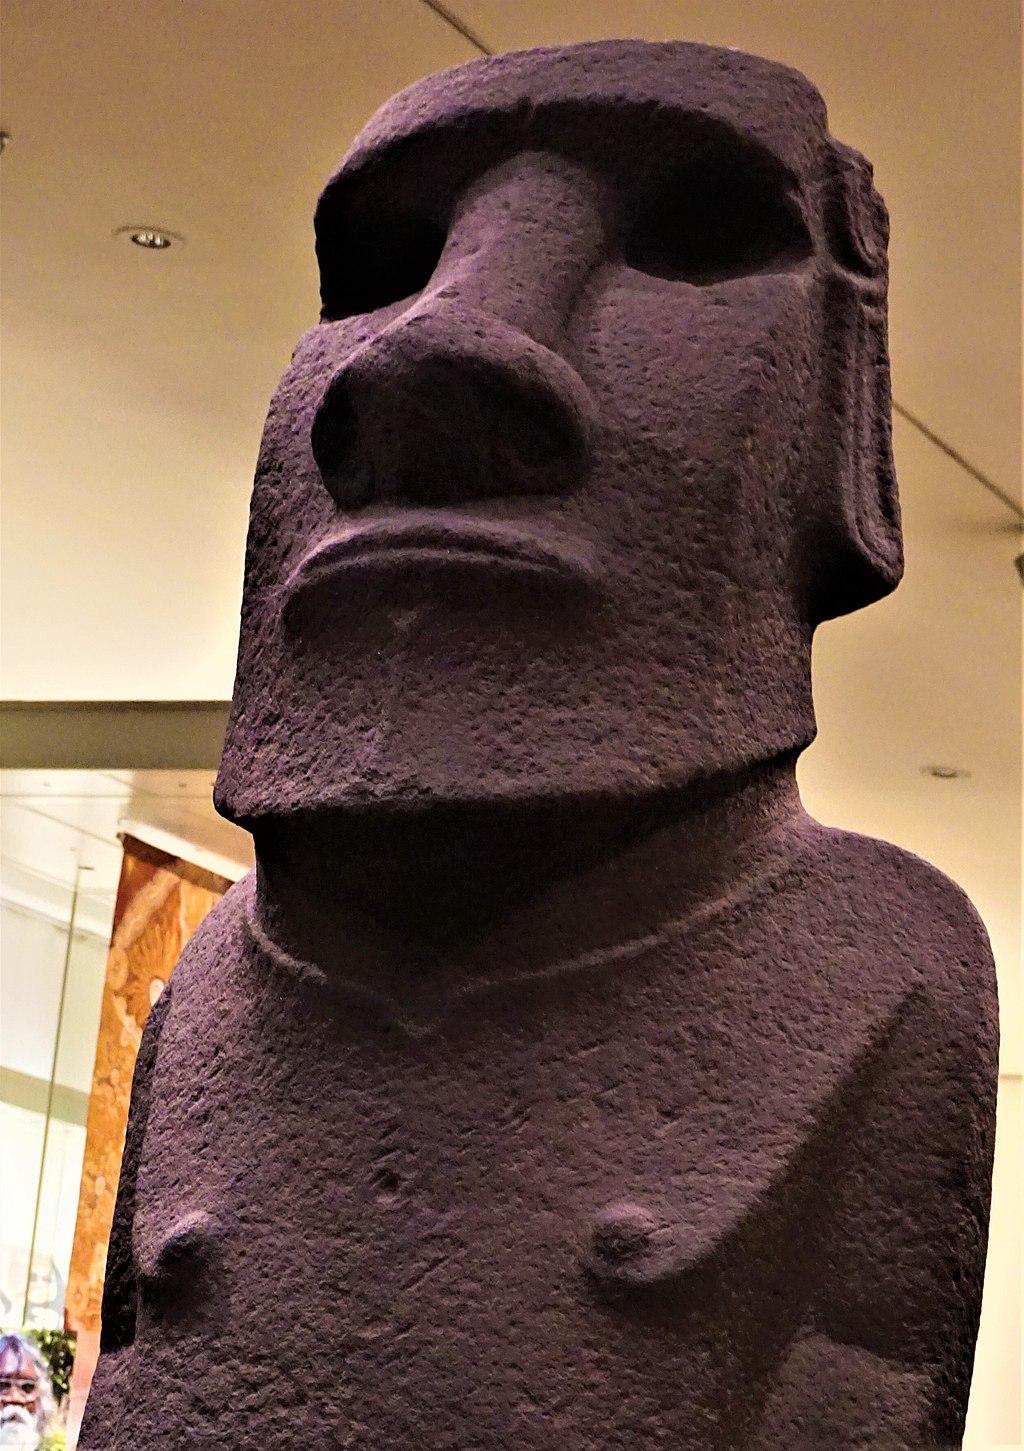 Hoa Hakananai'a - Moai from Easter Island